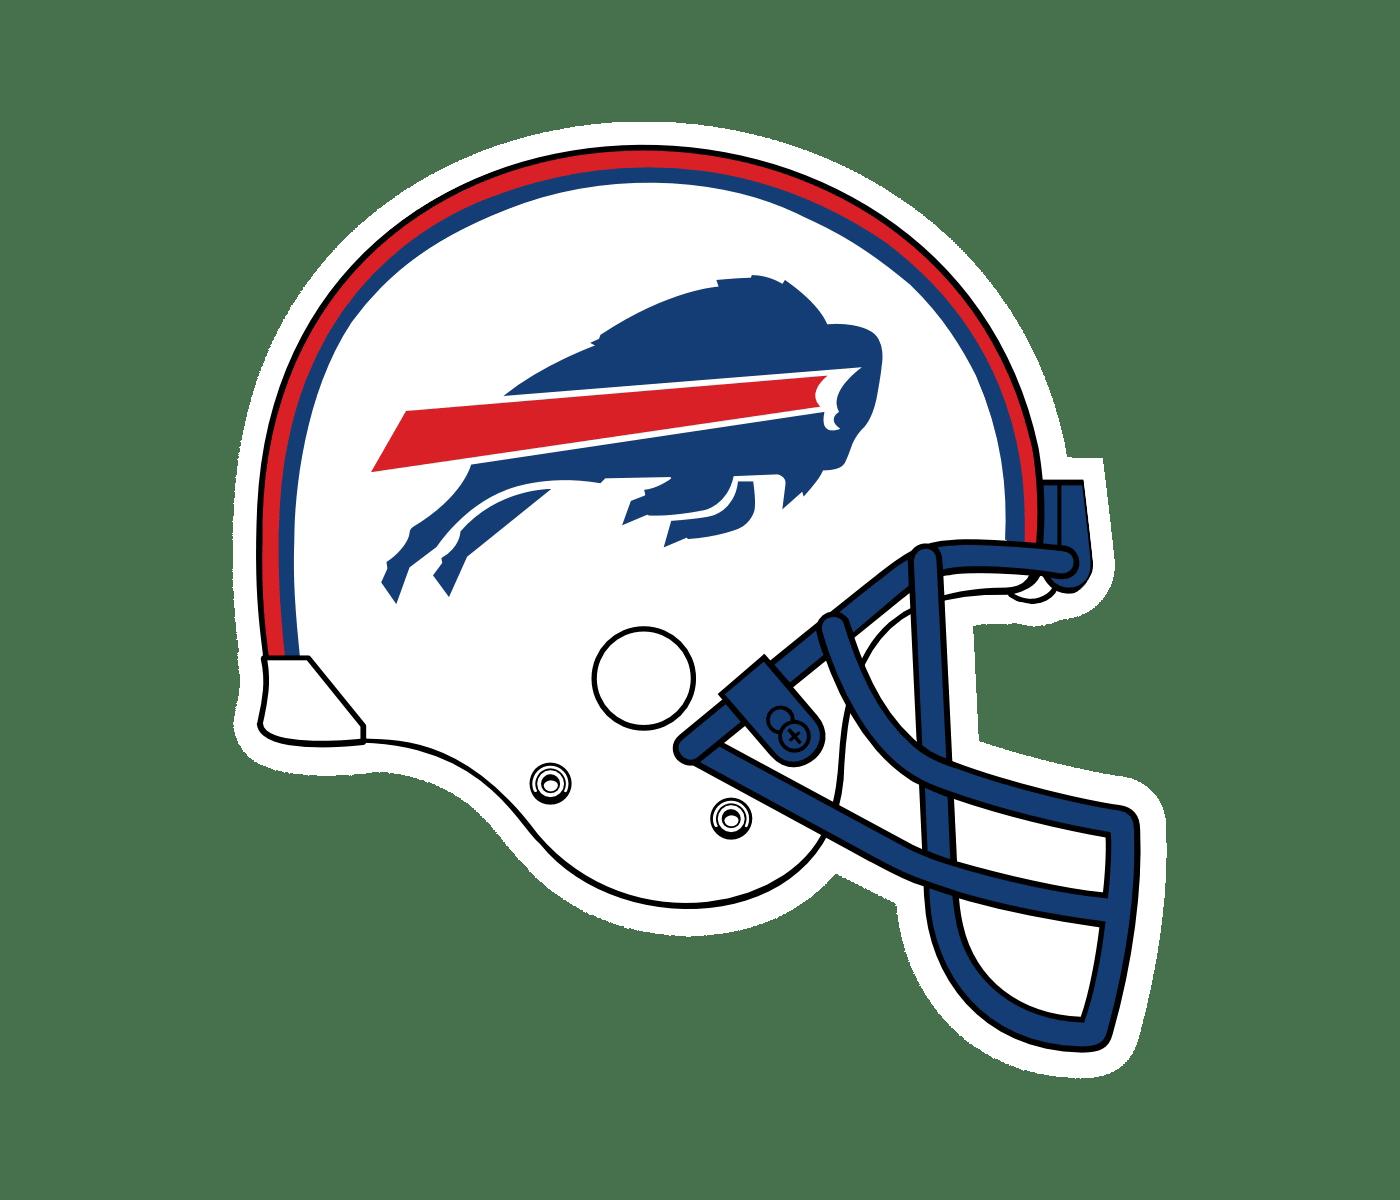 Buffalo Bills Logo Png Transparent Svg Vector Freebie Supply